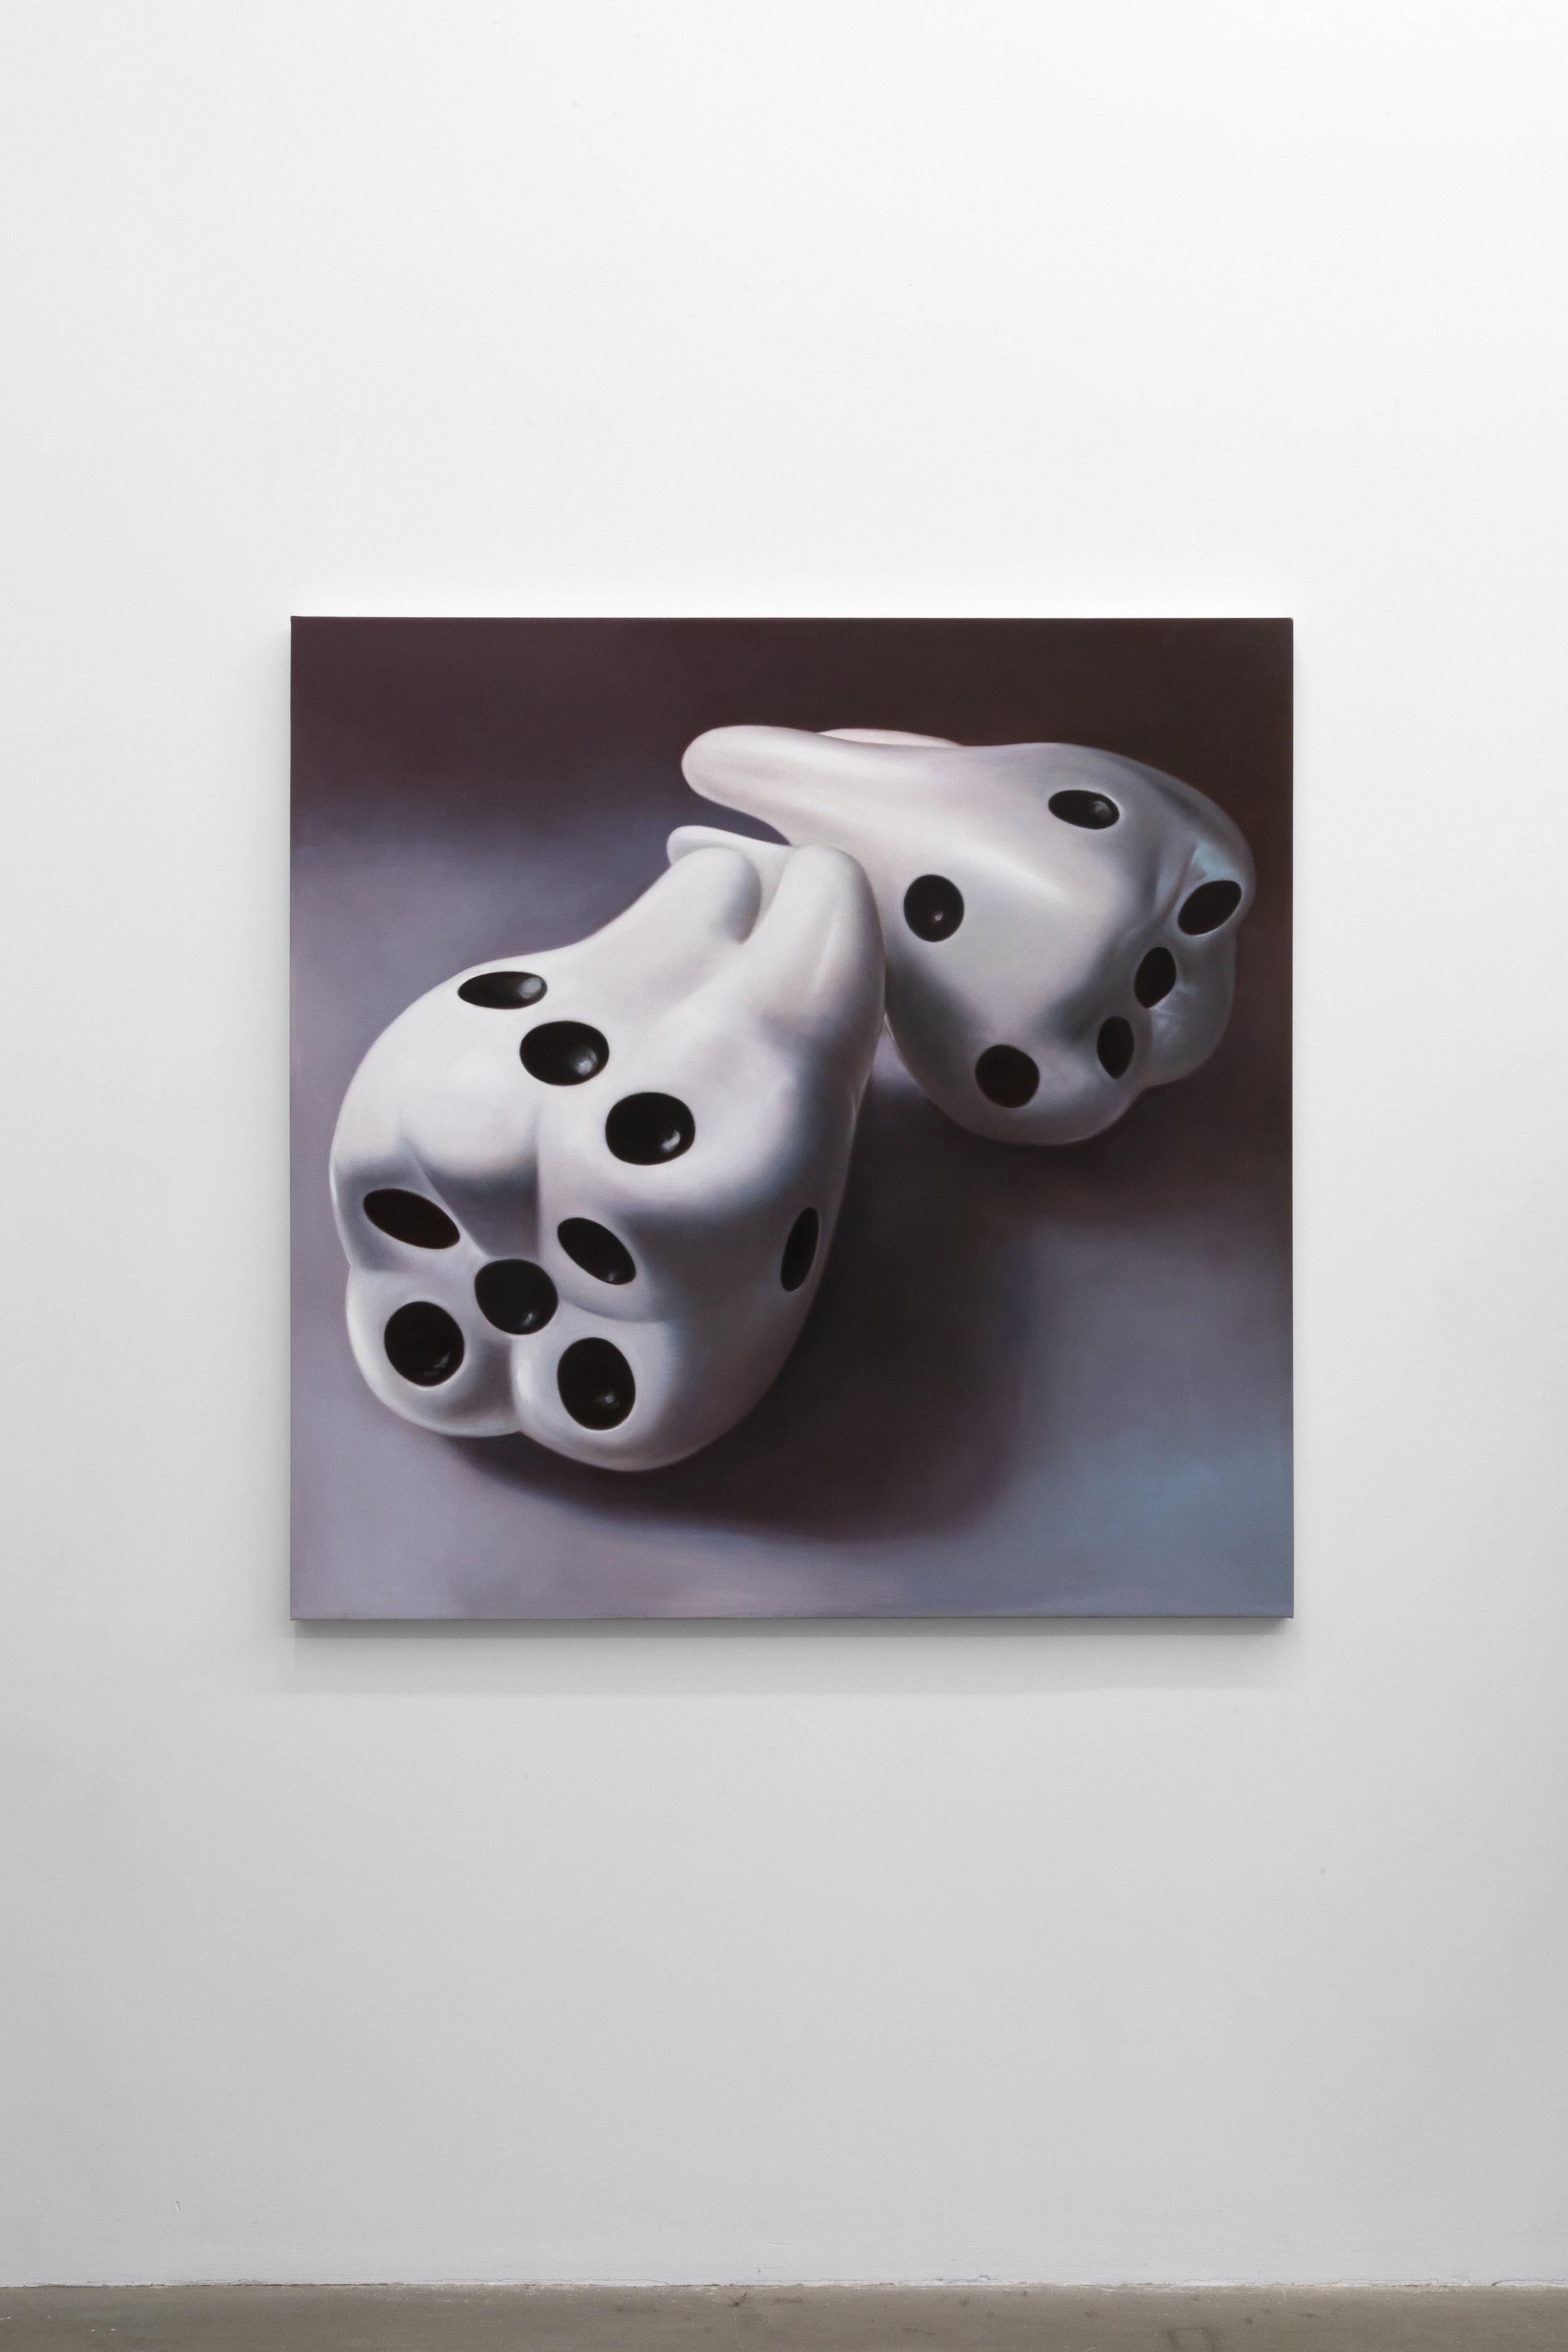 Jesse Harris,  Halftones , 2018, Oil on canvas, 48 x 48 in (121.9 x 121.9 cm)